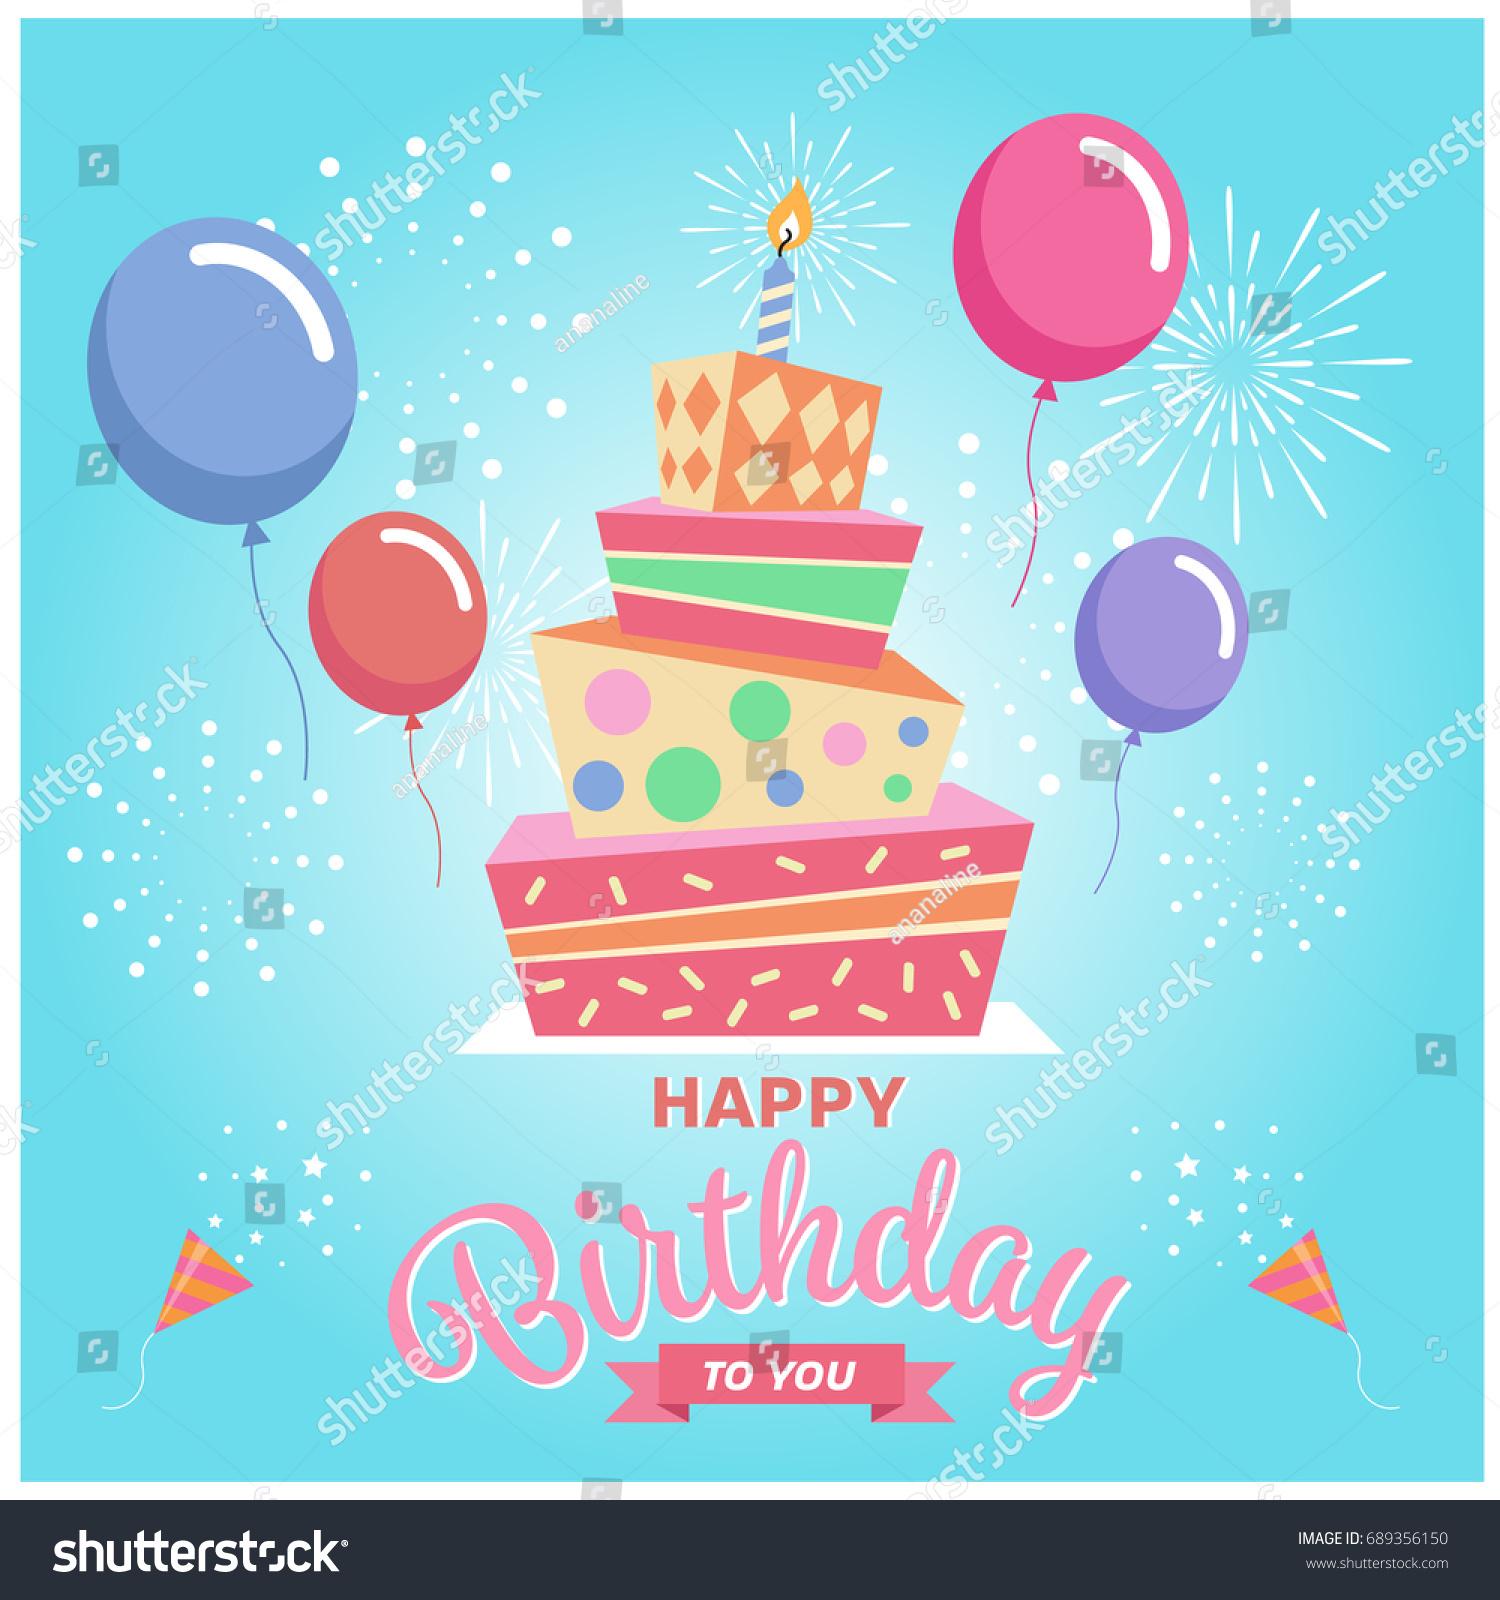 Happy Birthday You Square Cake Balloon Stock Vector Royalty Free